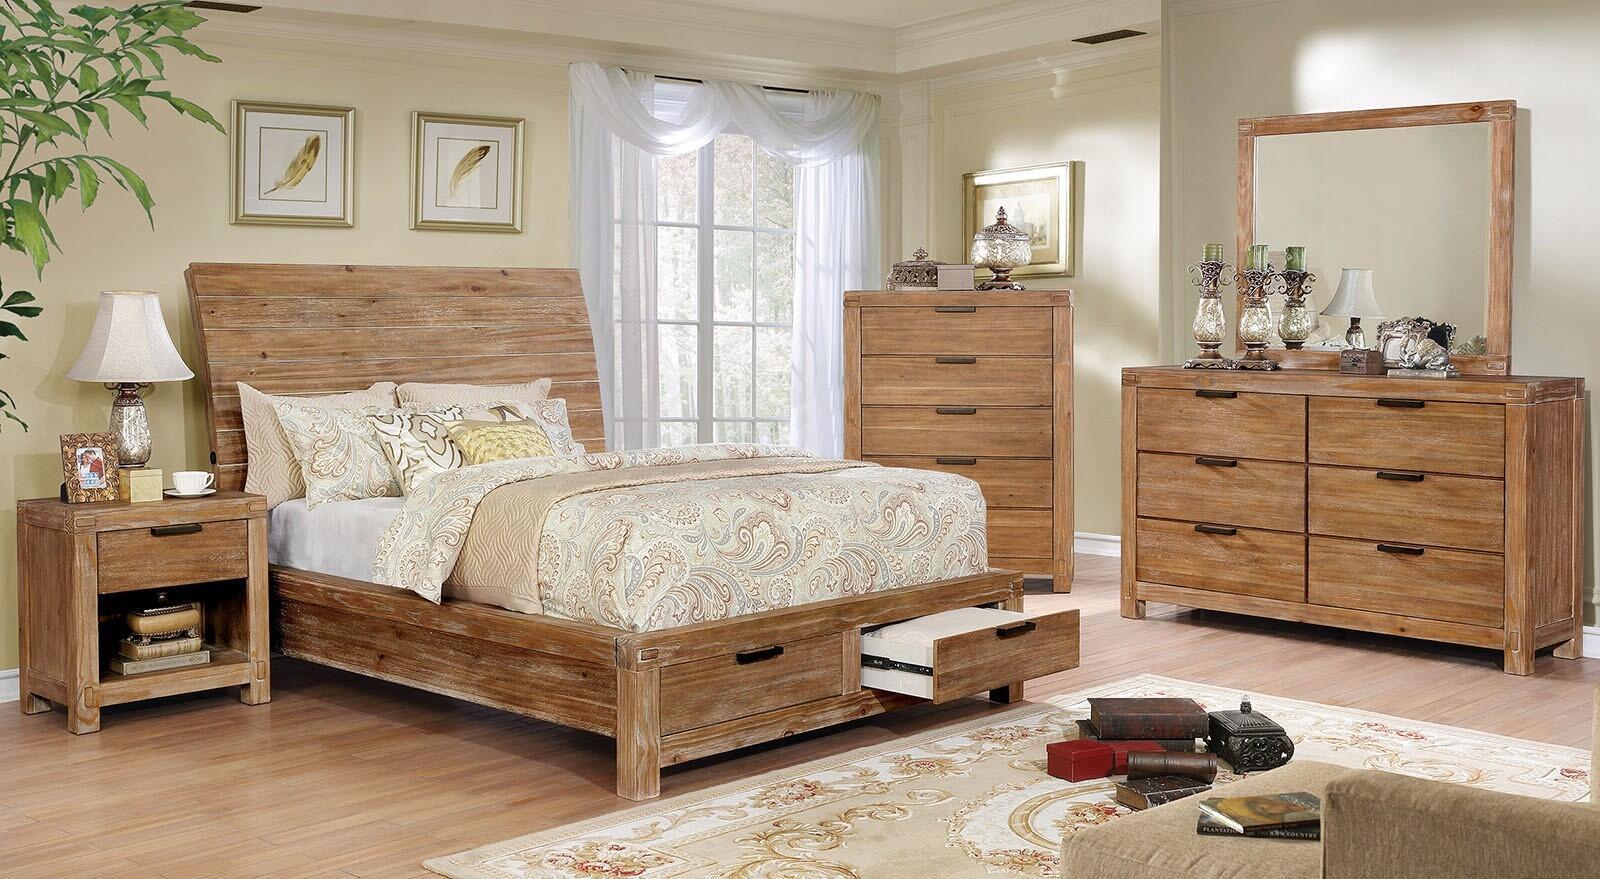 Furniture Of America Cm7361qbeddmsc 5 Pieces Bedroom Set With